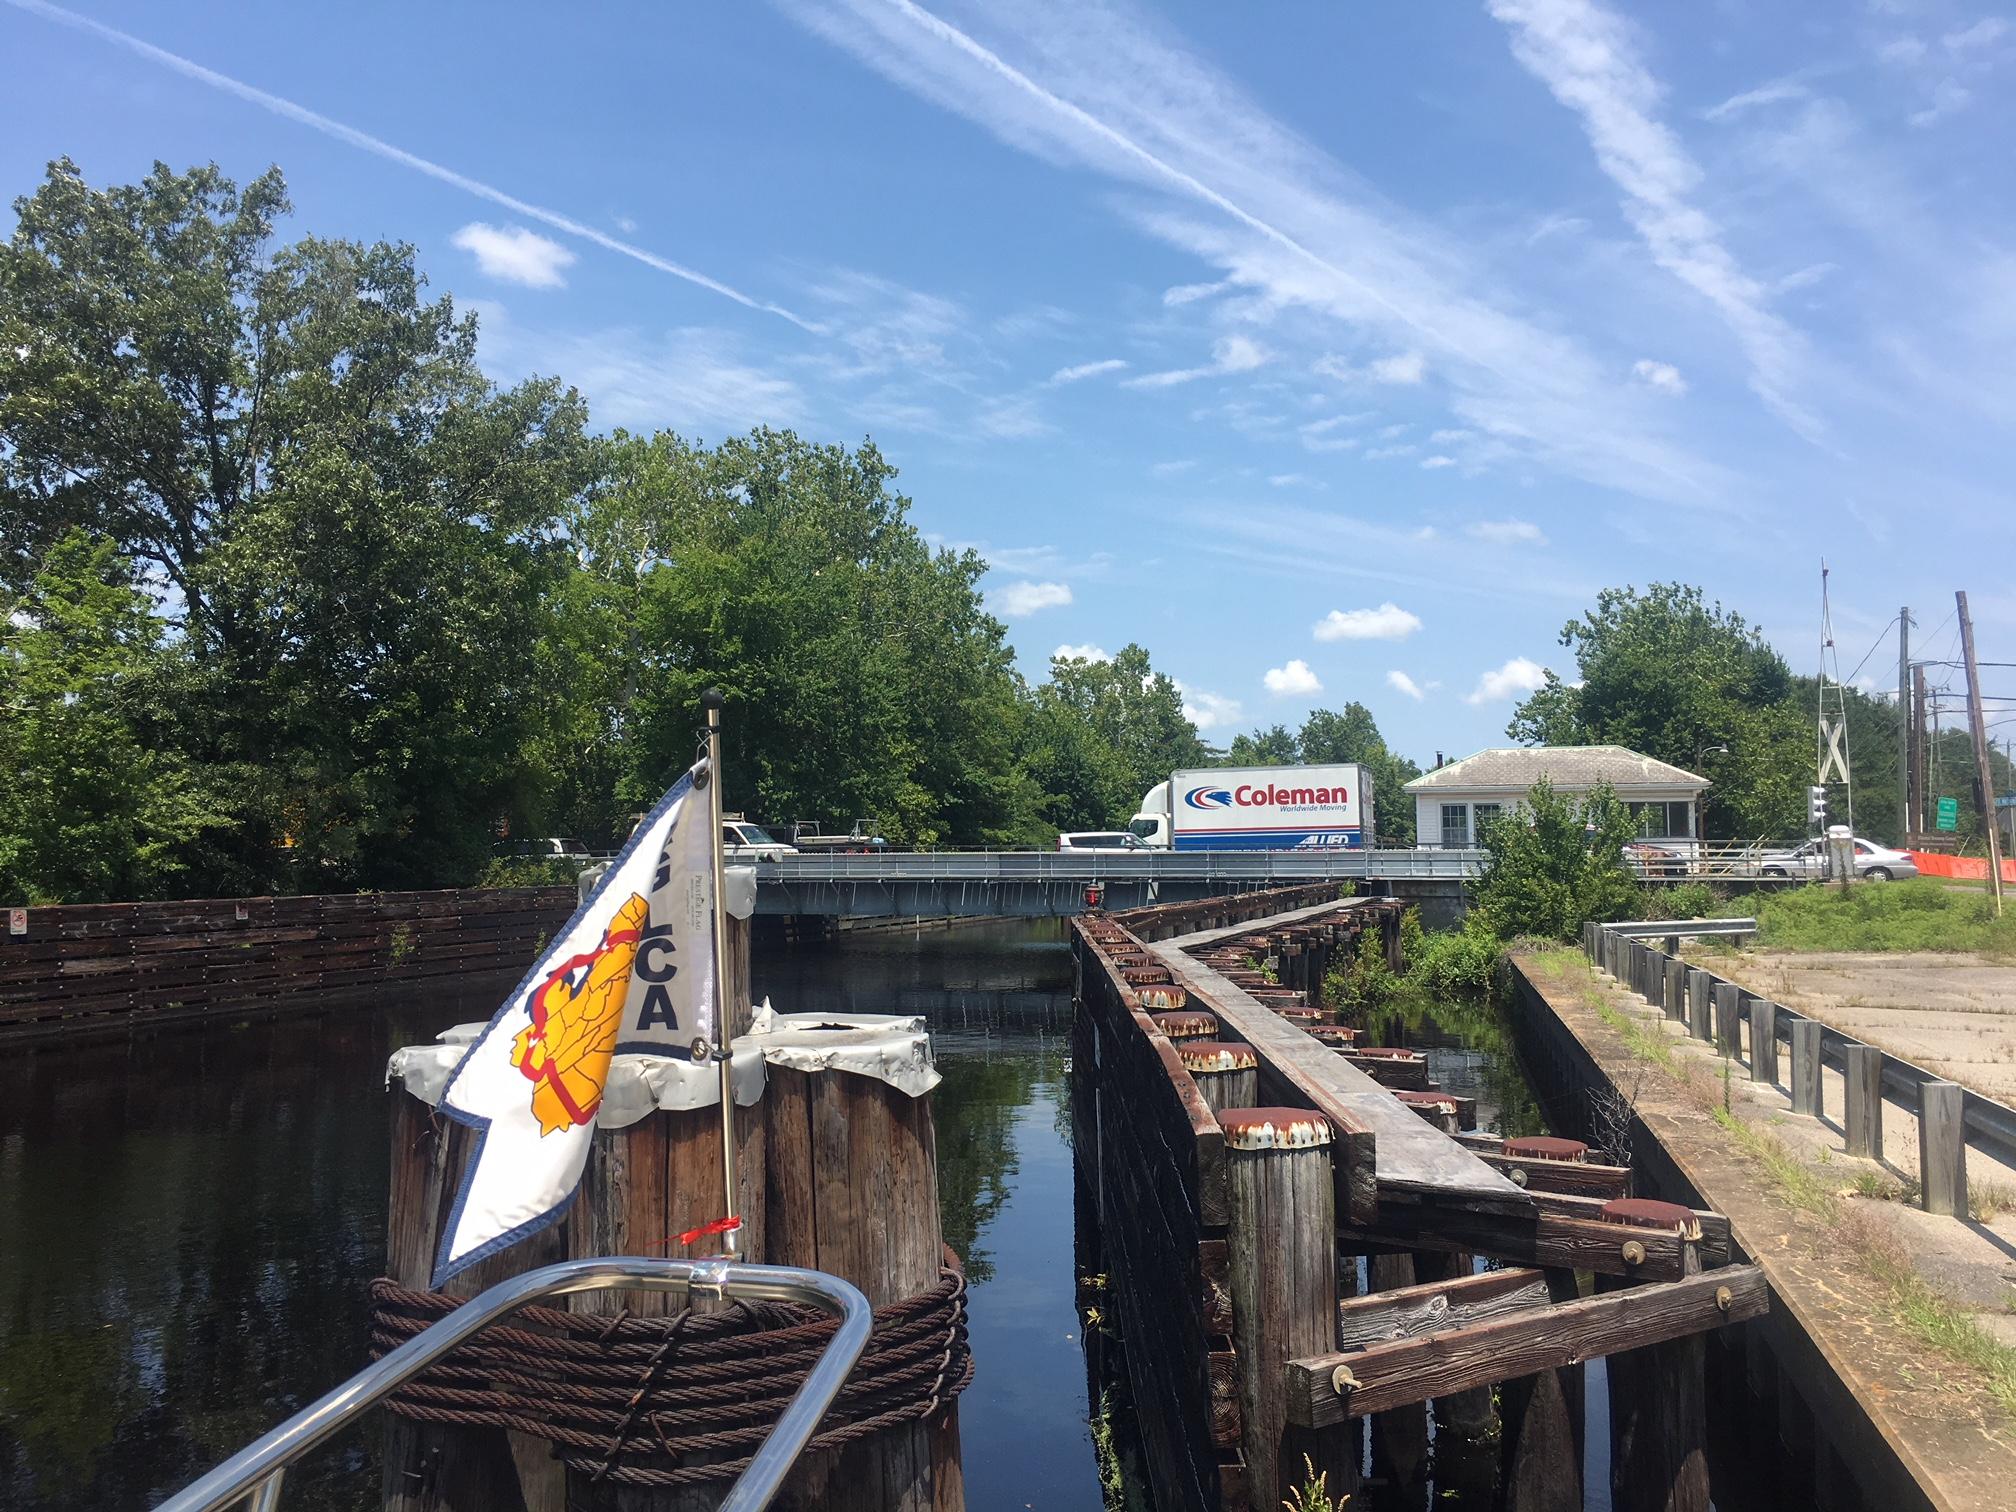 Last bridge and lock heading - now in VA